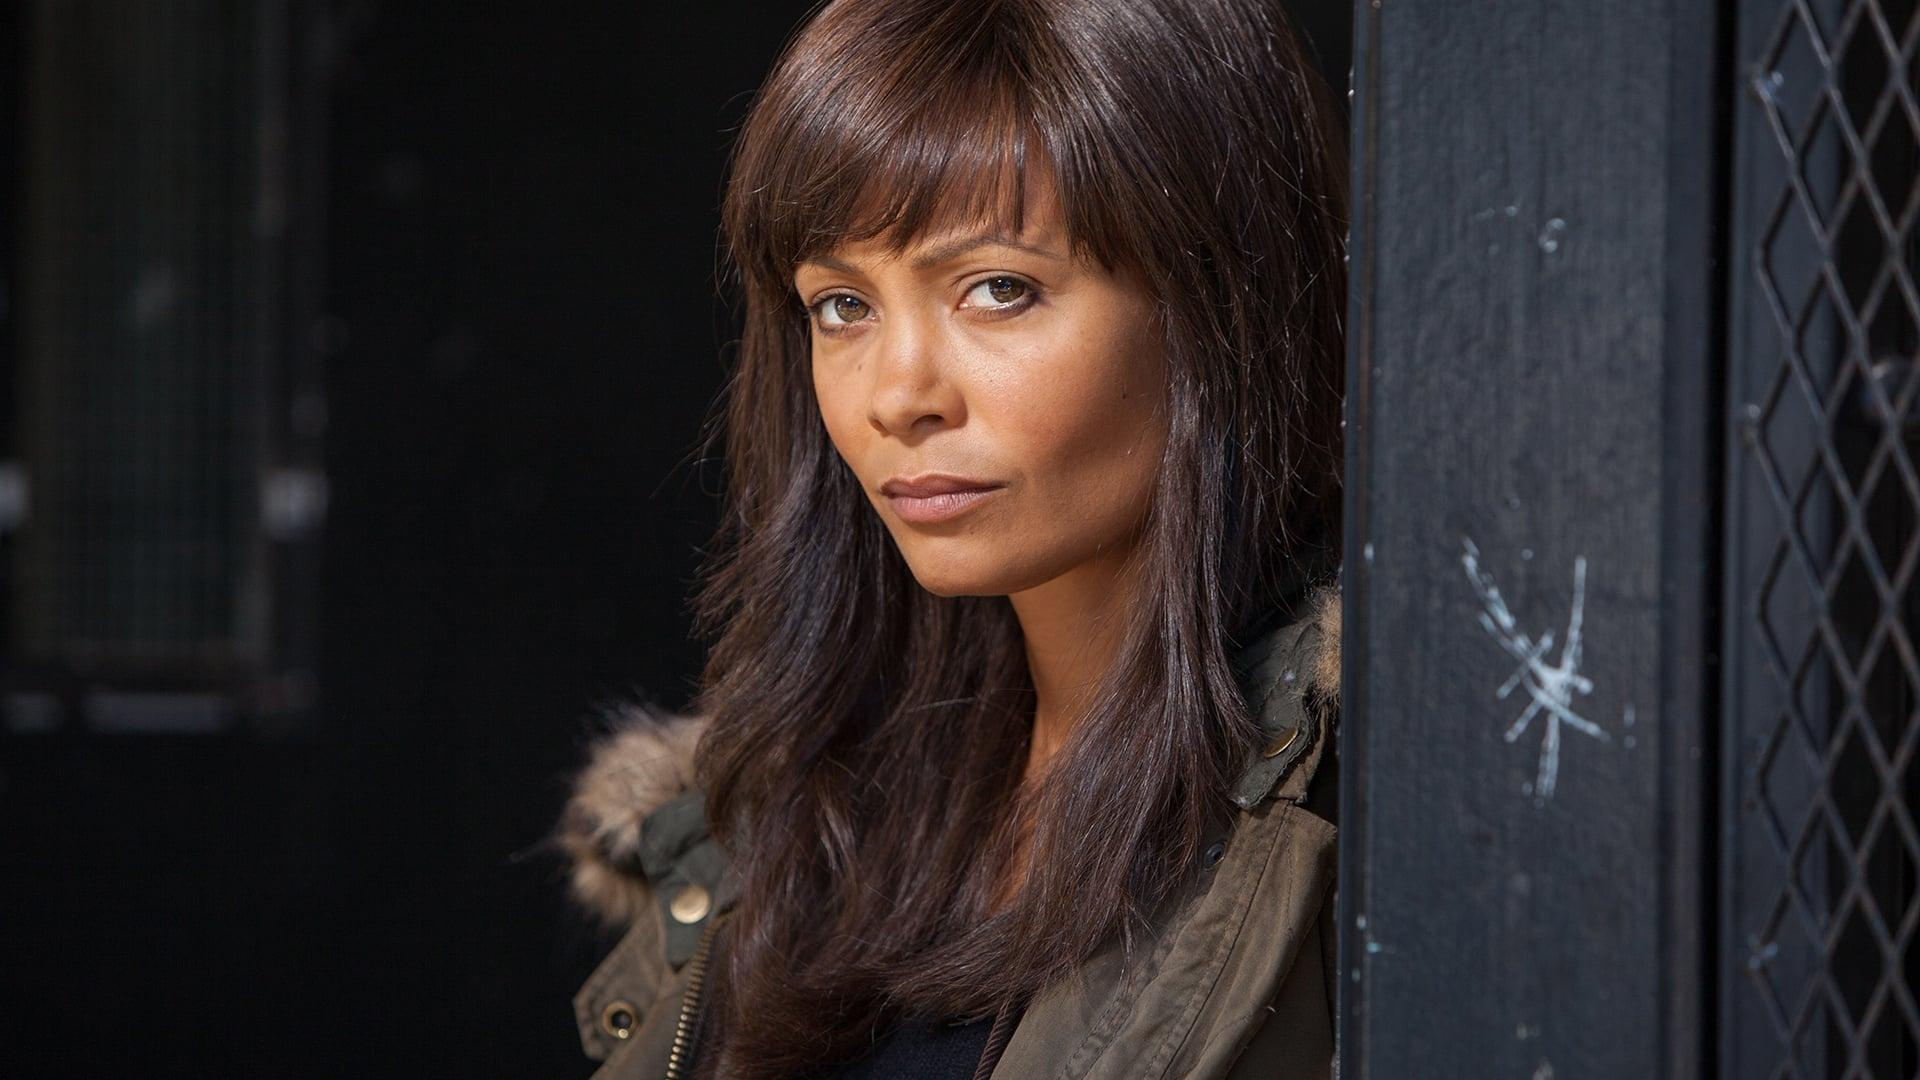 Rogue renewed for second season